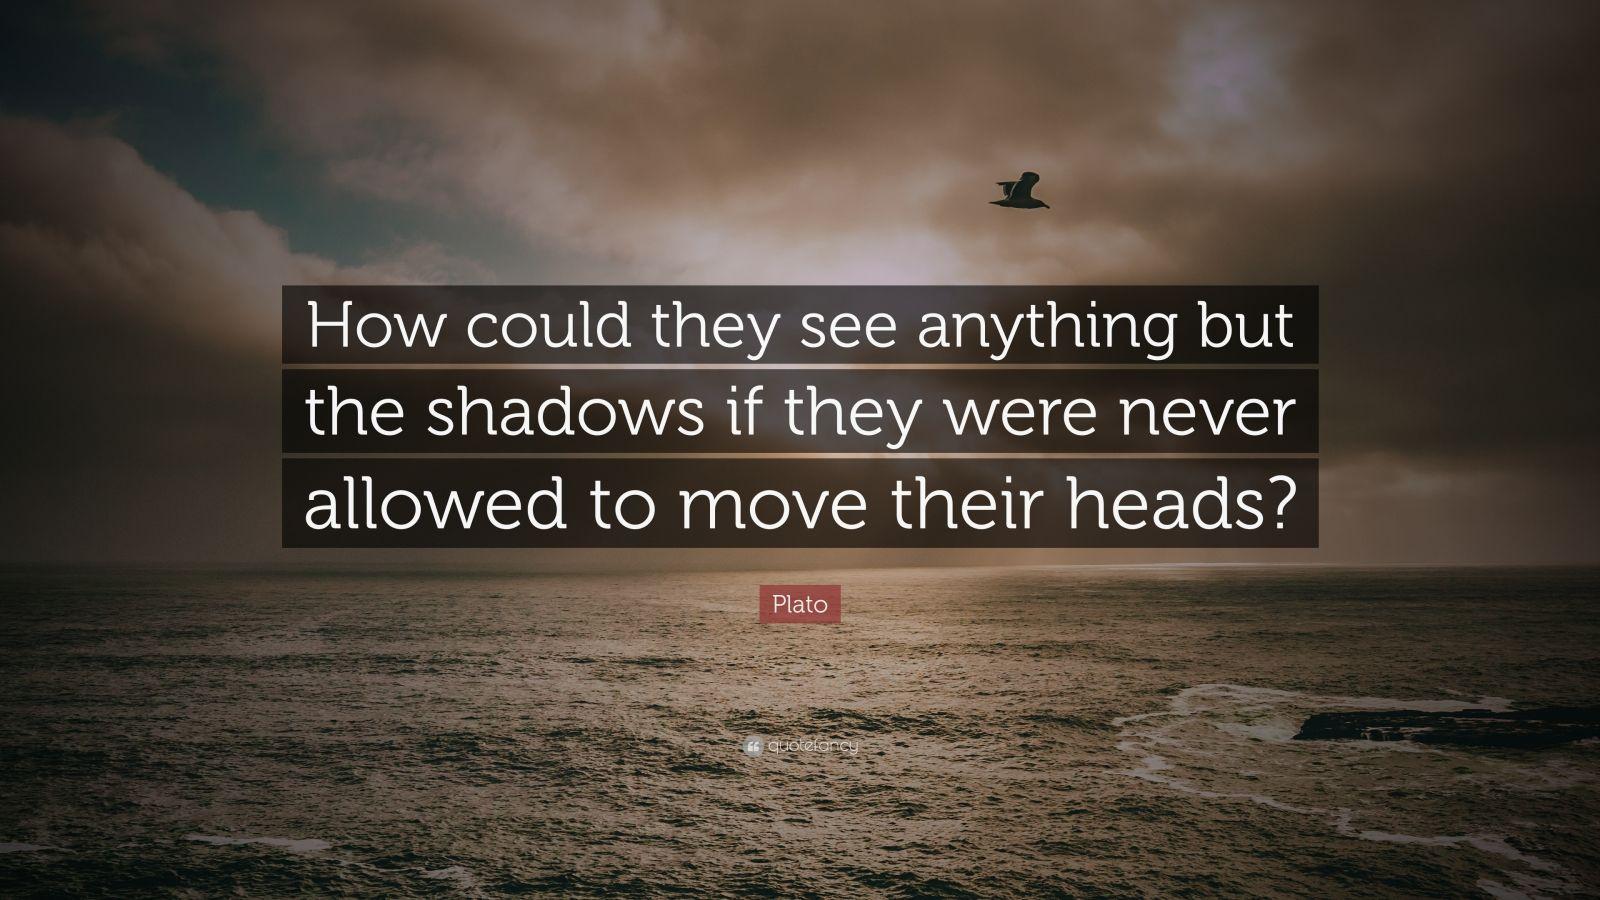 Seeing shadows move